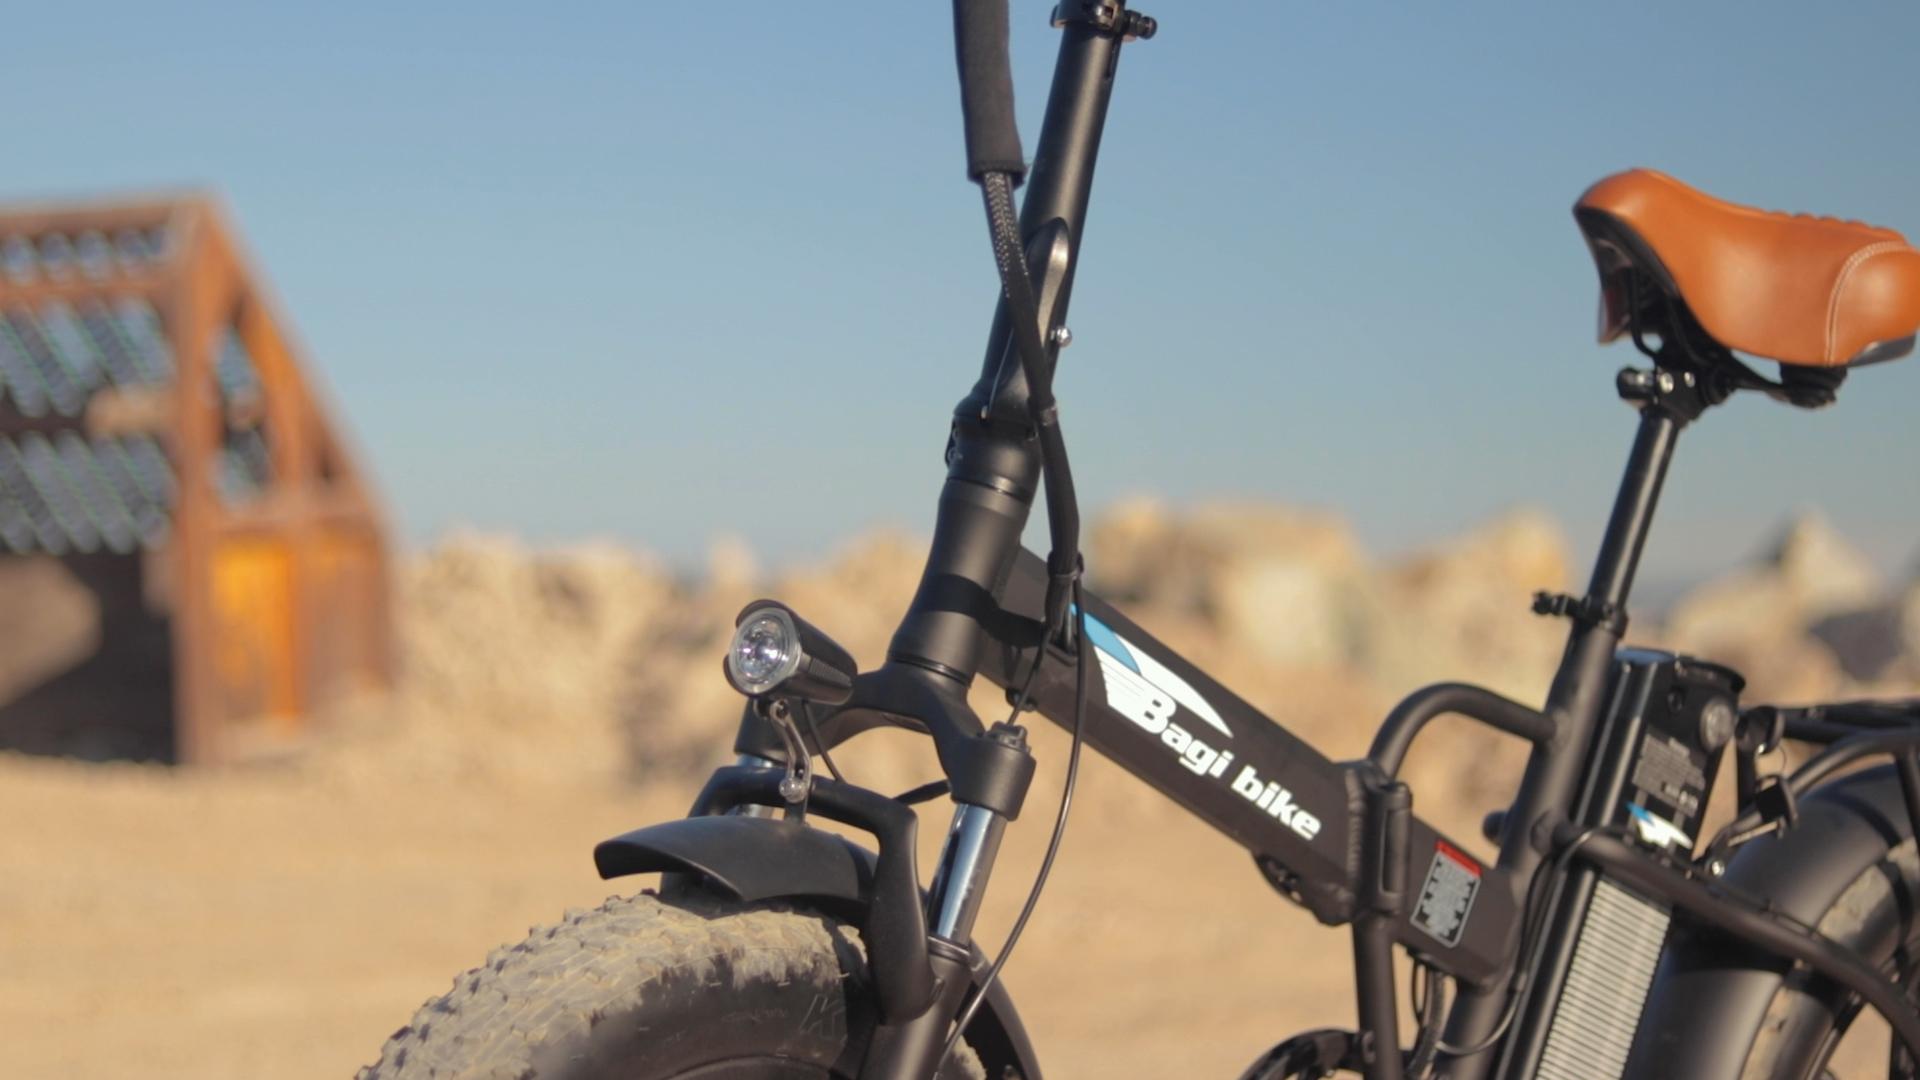 electrified-reviews-bagibike-b20-premium-electric-bike-review-mozo-suspension-2.jpg